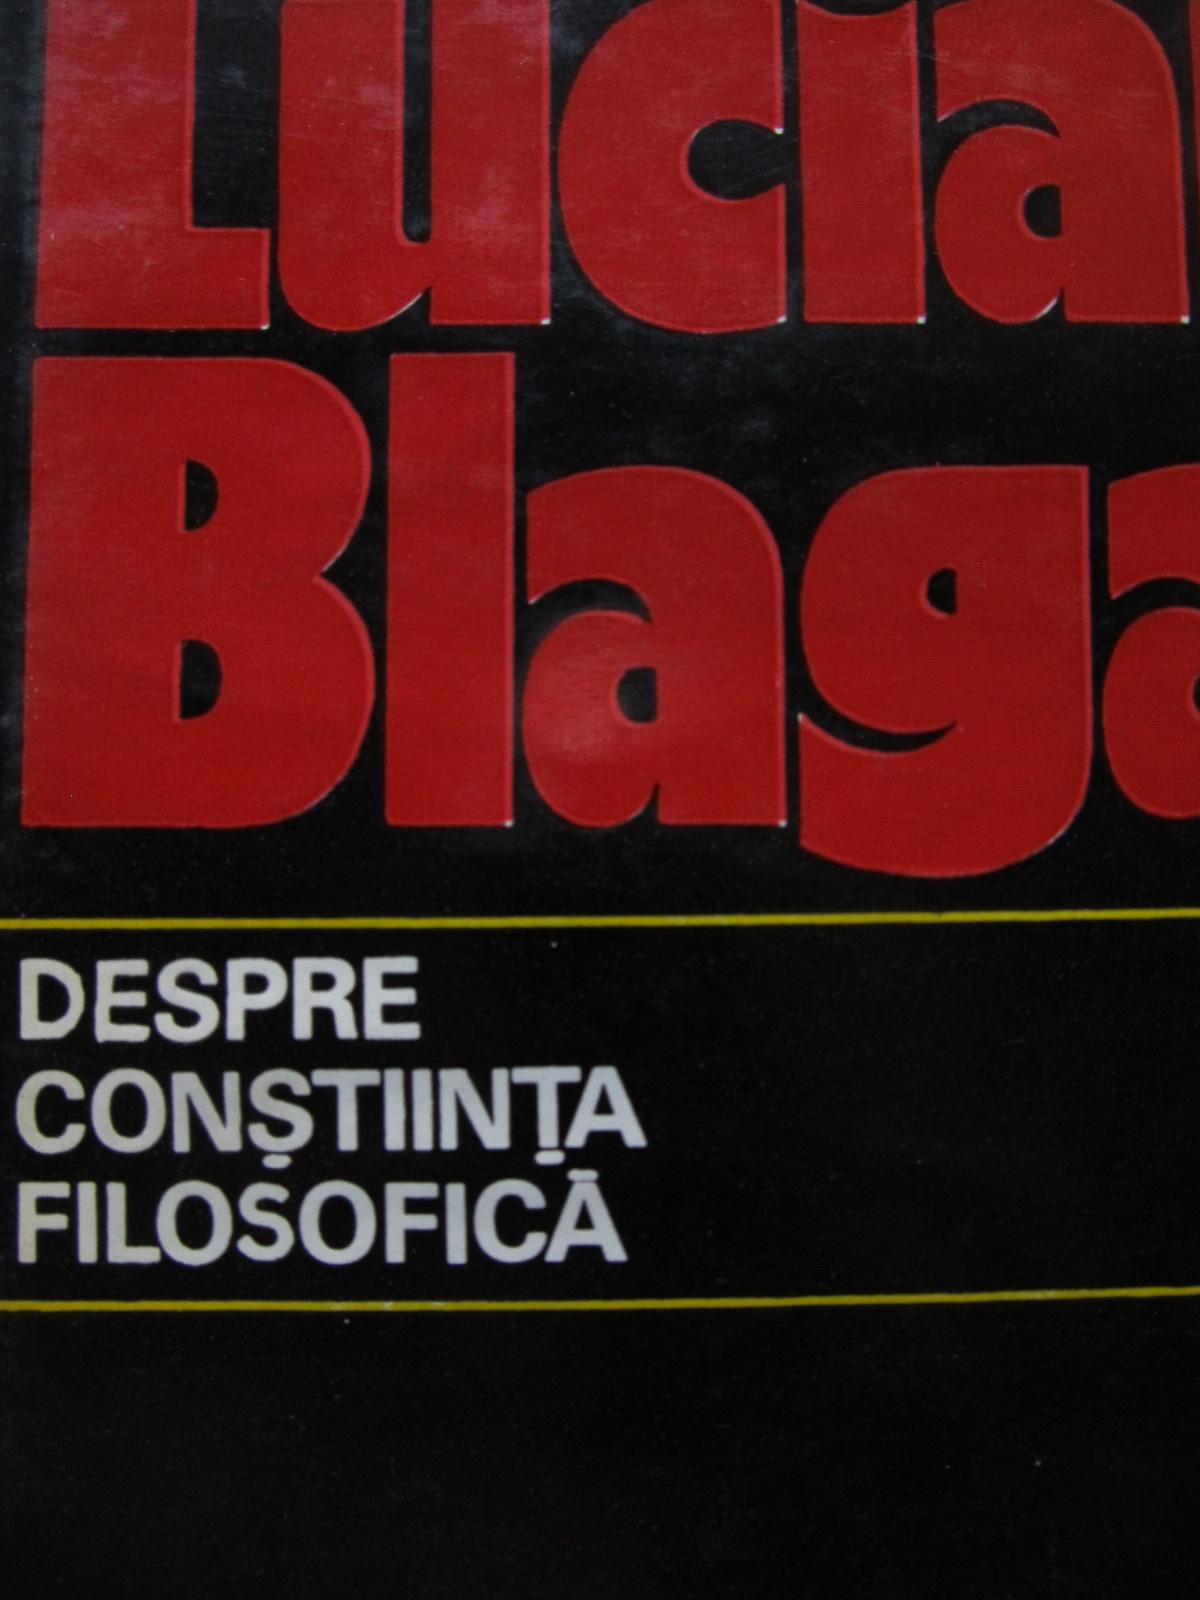 Despre constiinta filosofica [1] - Lucian Blaga | Detalii carte